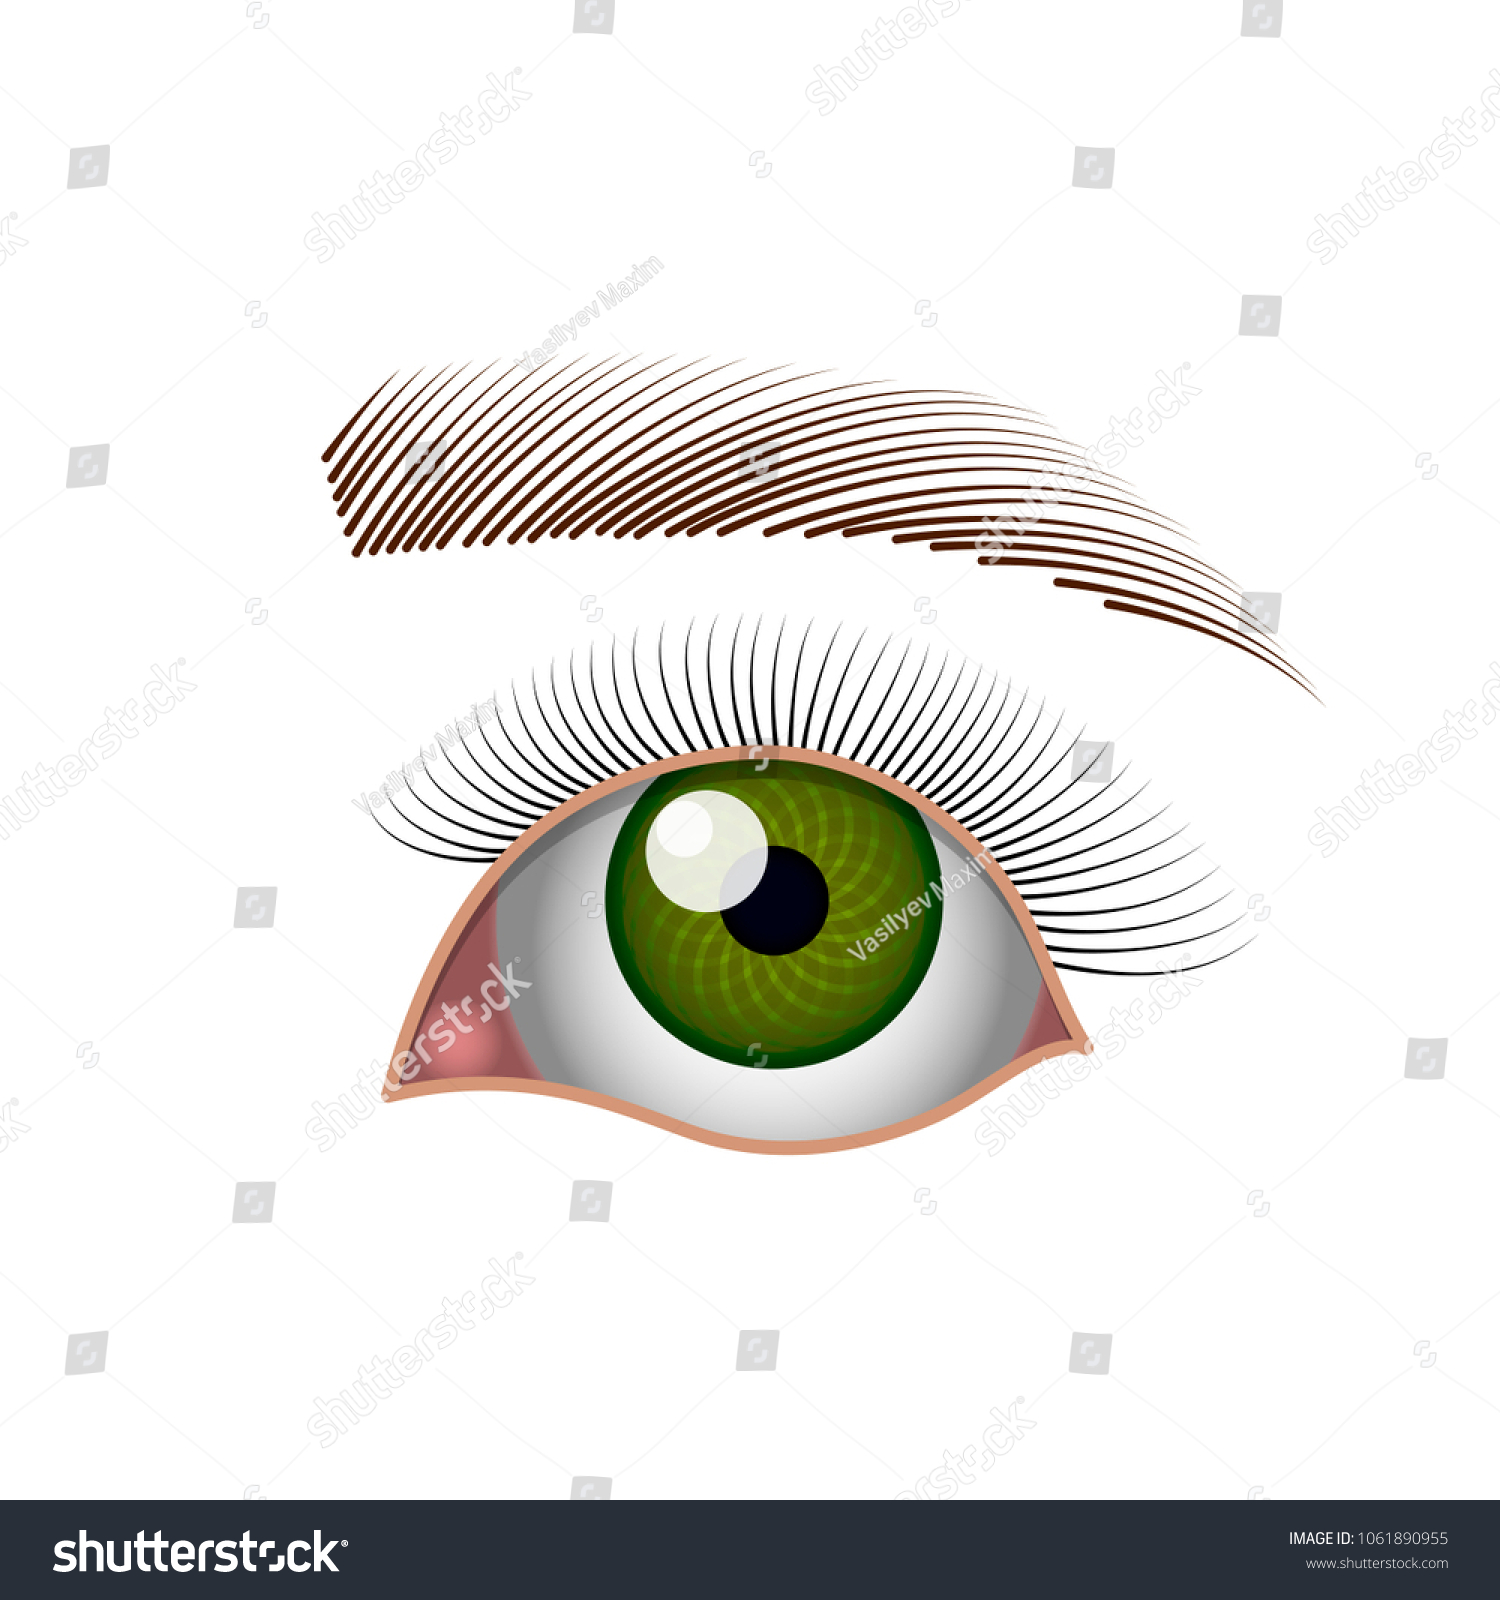 Eye Green Eye Eyelashes Eyebrow Simple Stock Vector Royalty Free 1061890955